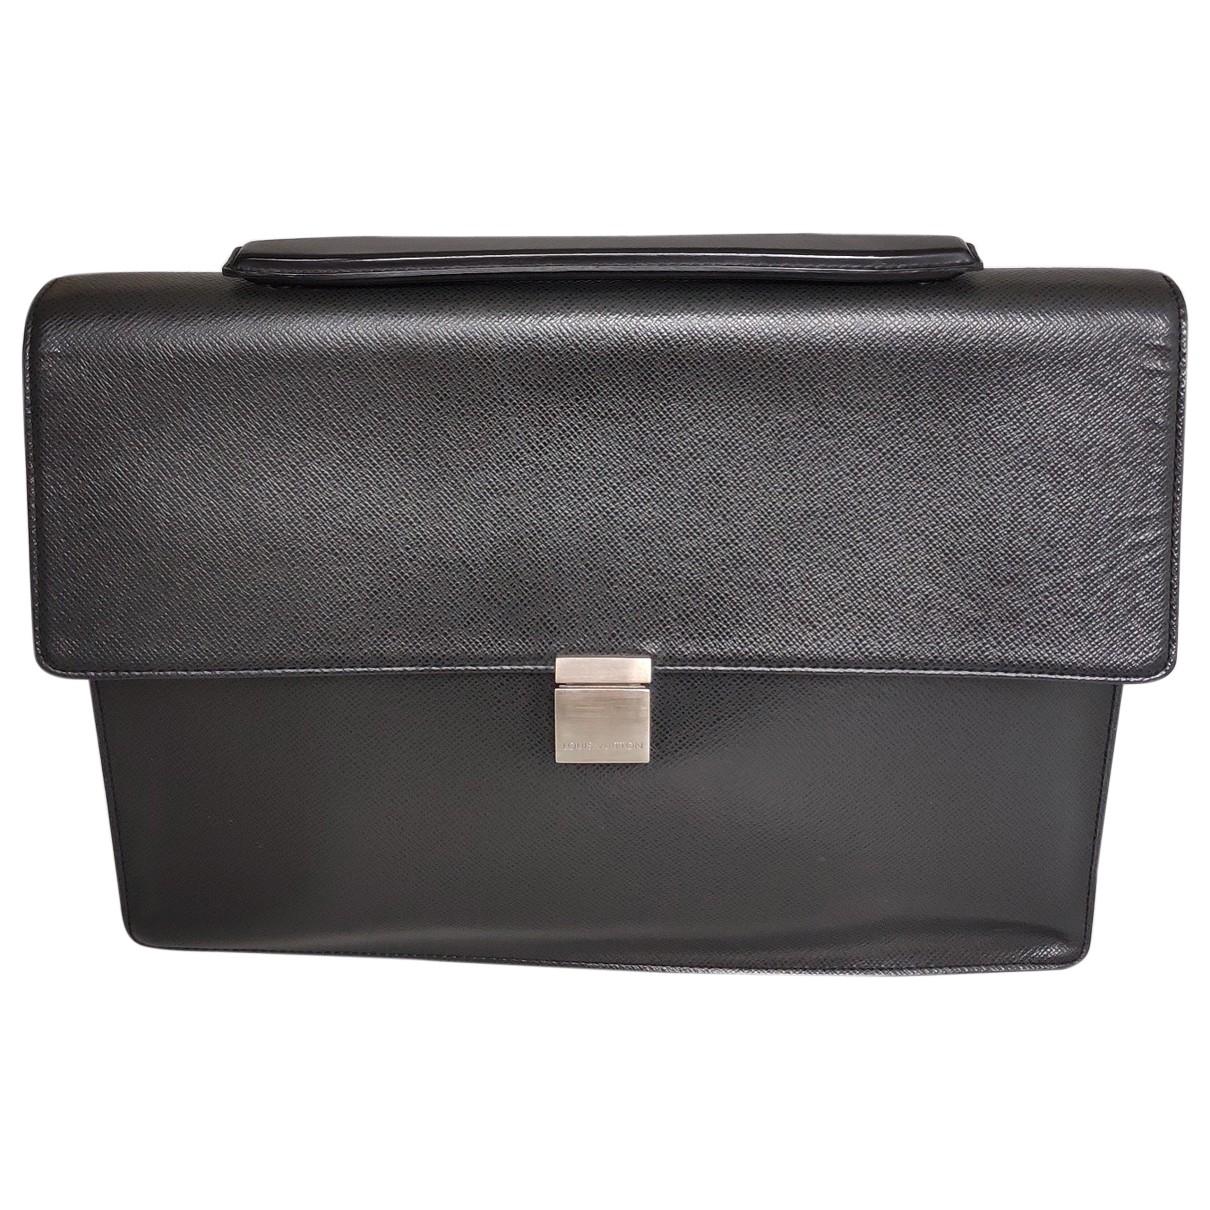 Louis Vuitton \N Black Leather bag for Men \N